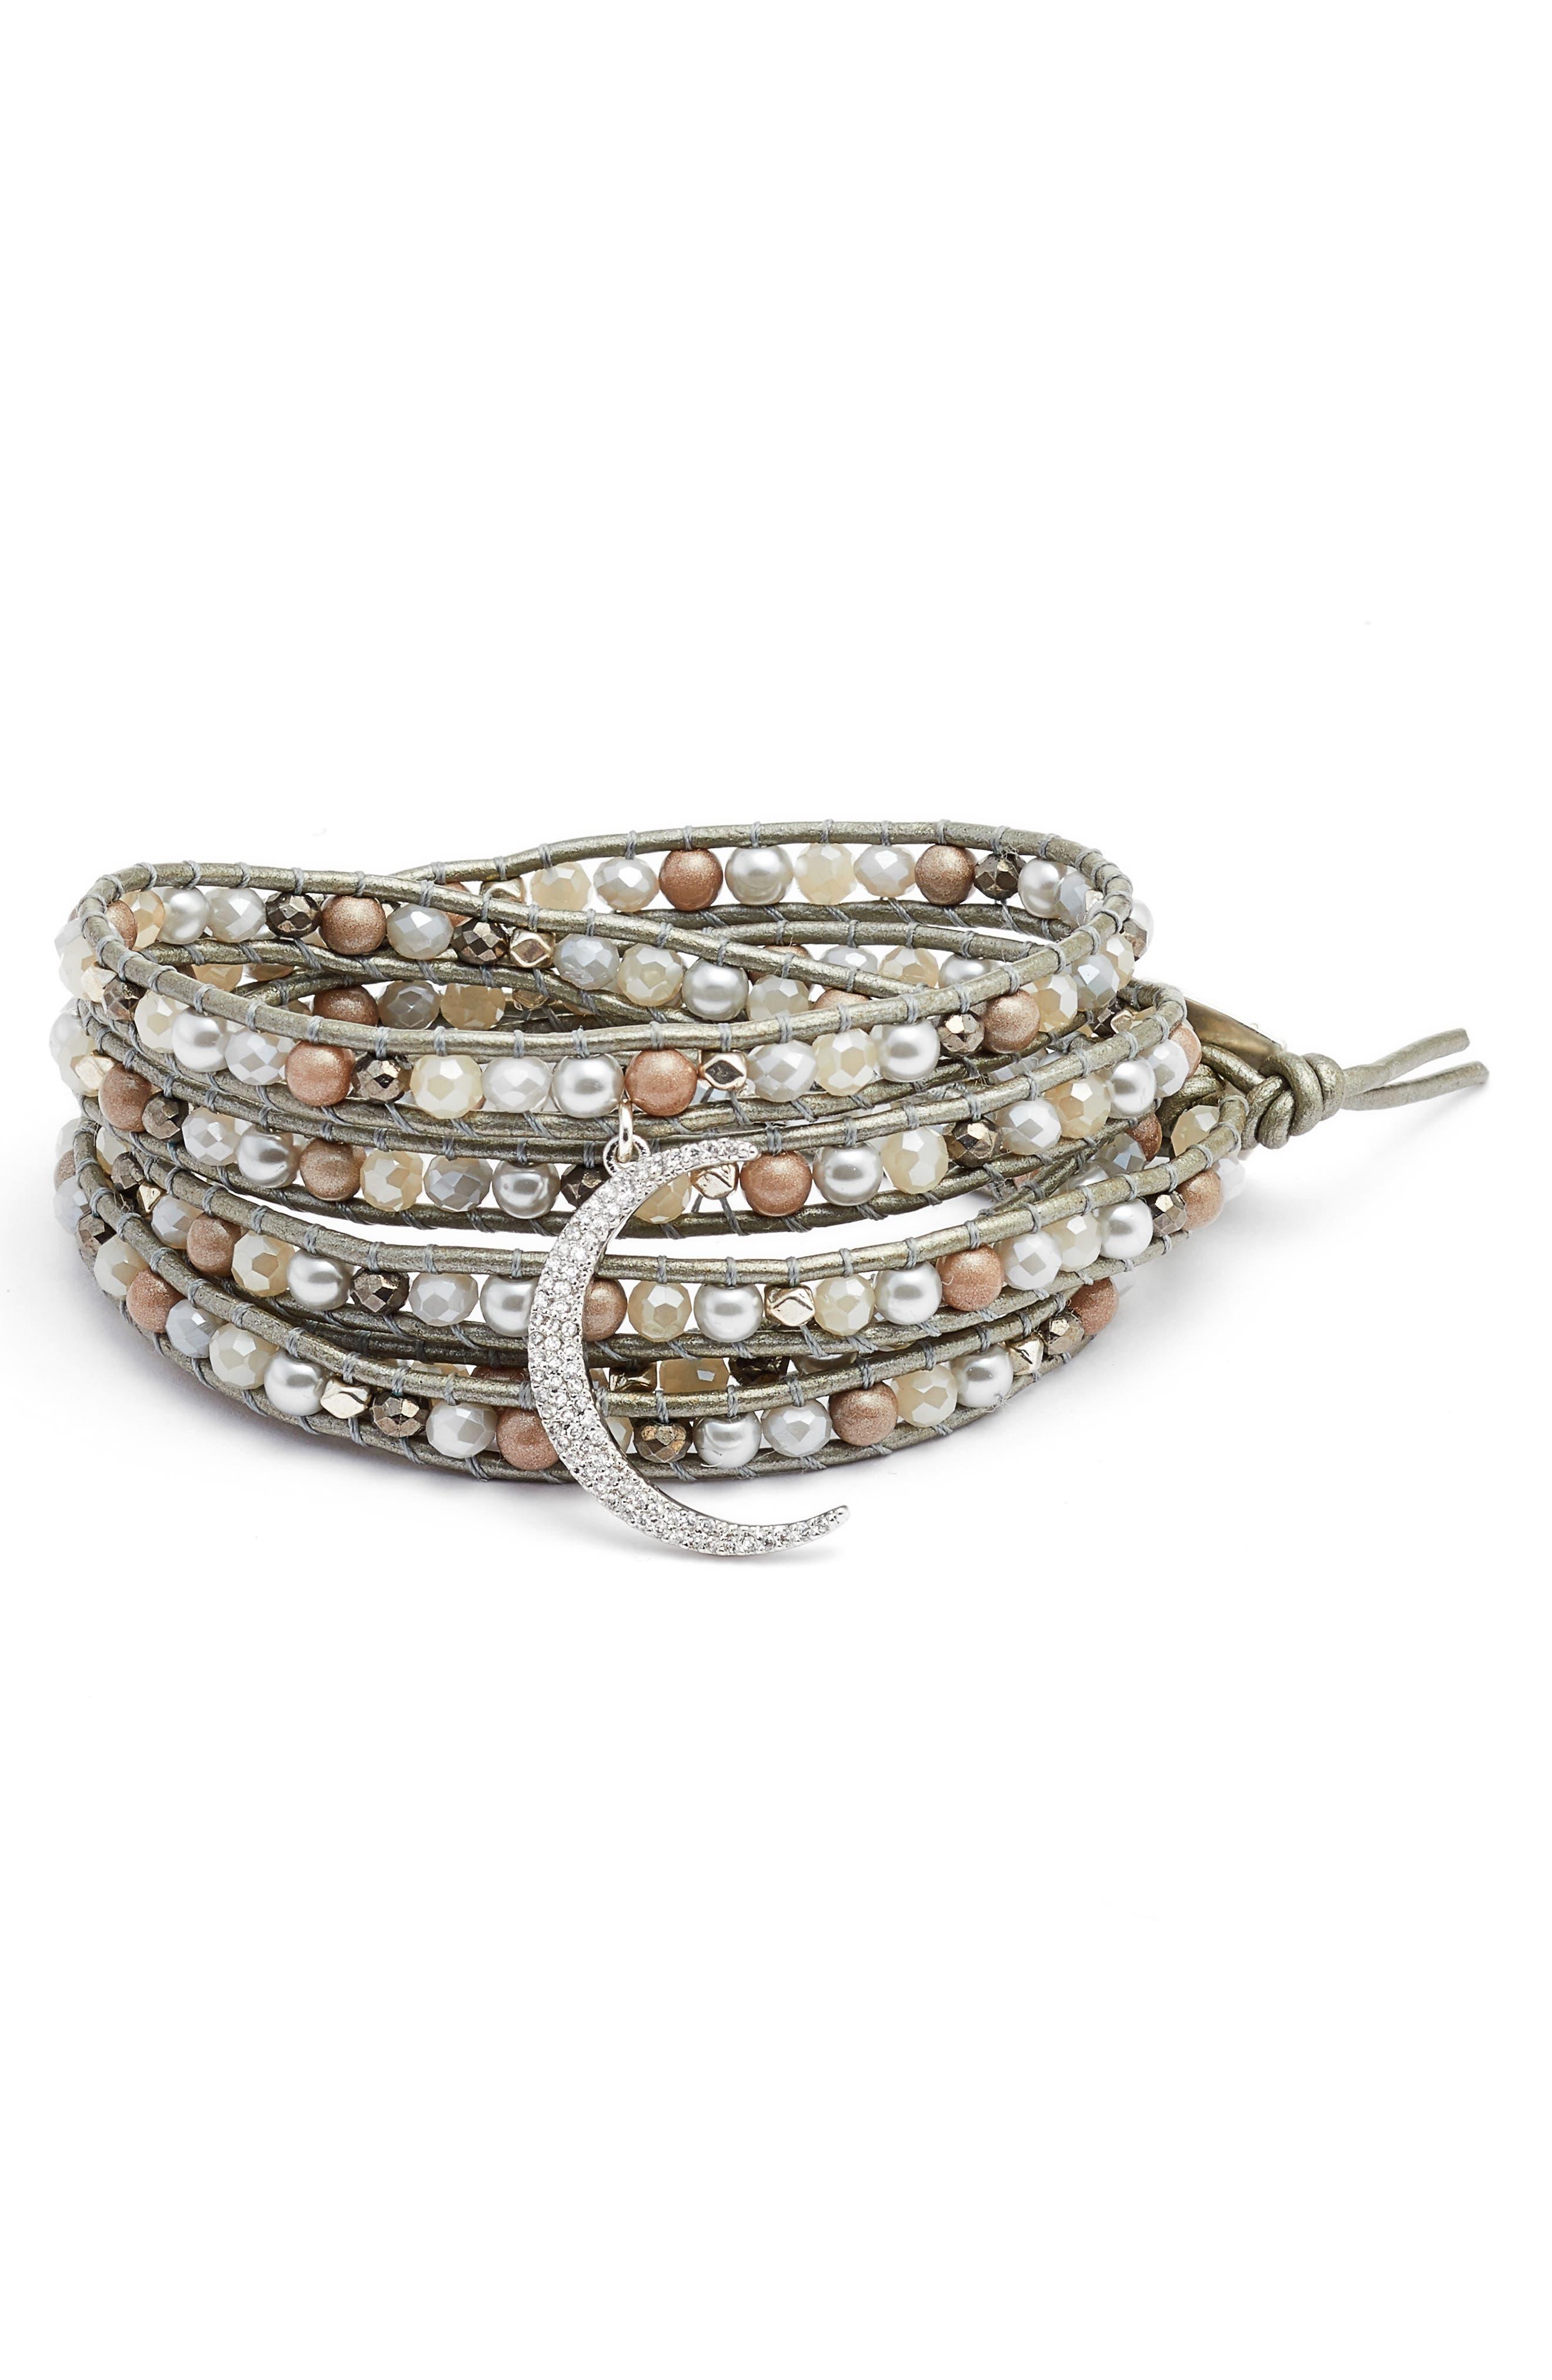 Crystal Charm Wrap Bracelet,                             Main thumbnail 1, color,                             Grey